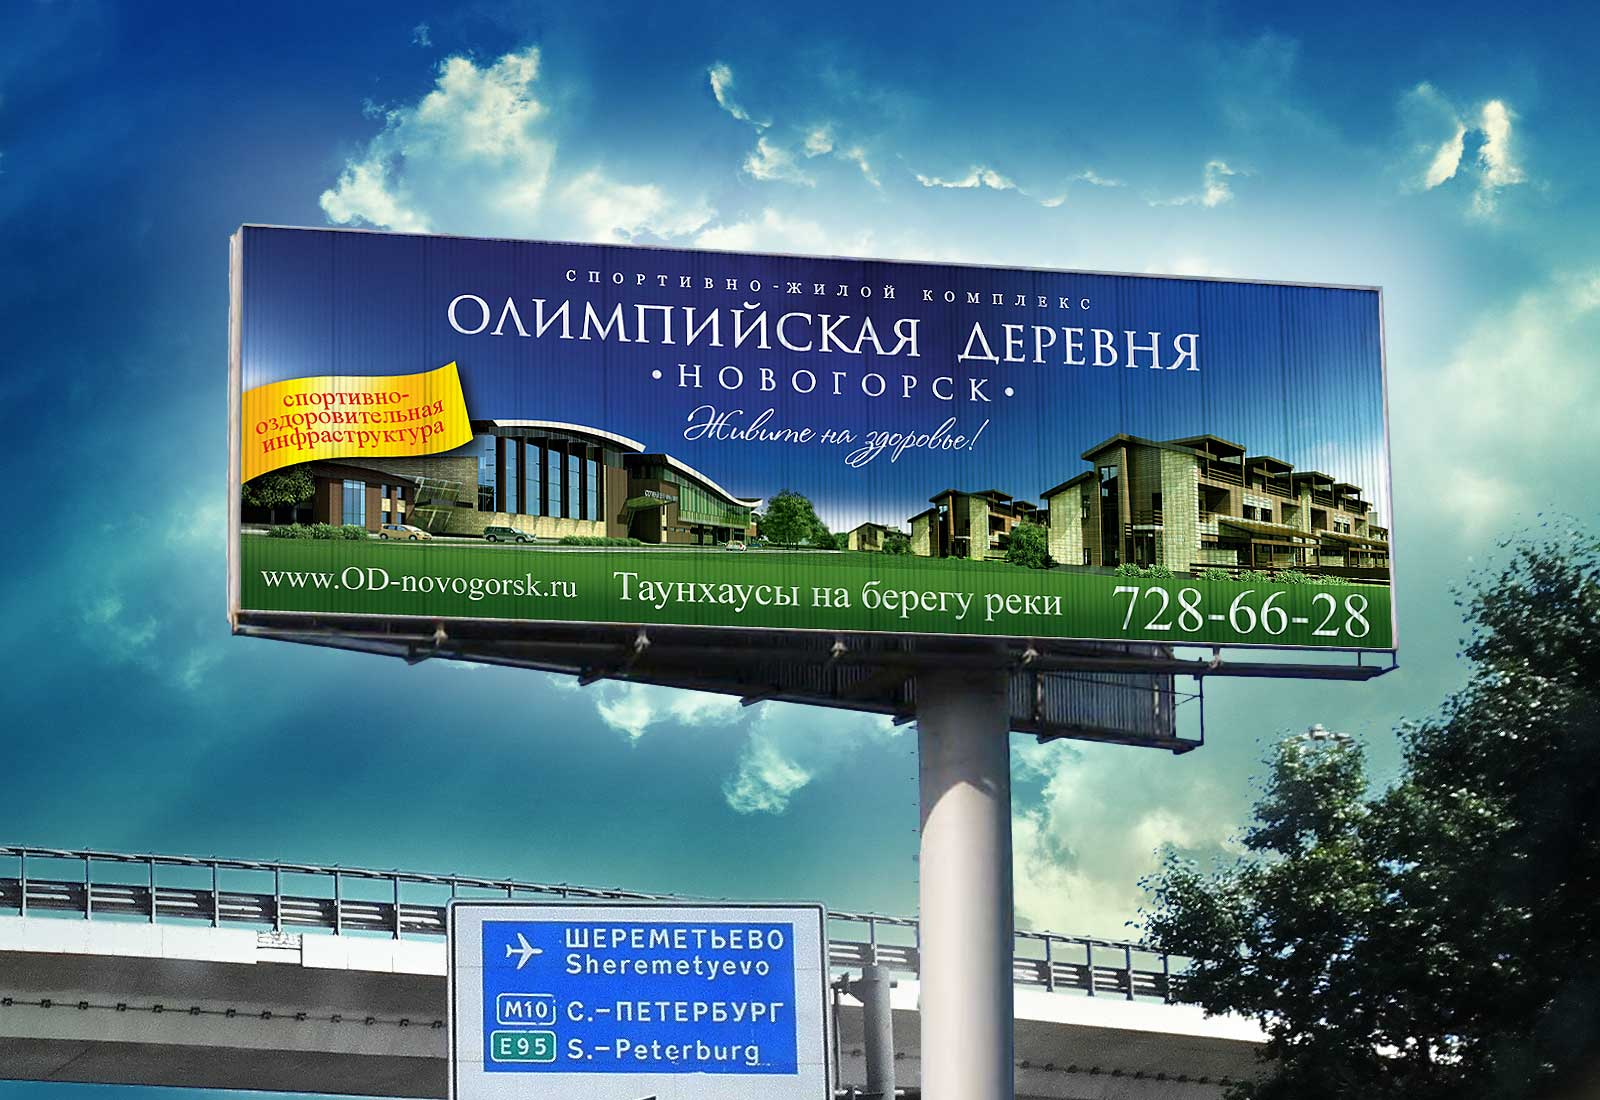 Олимпийская деревня Новогорск